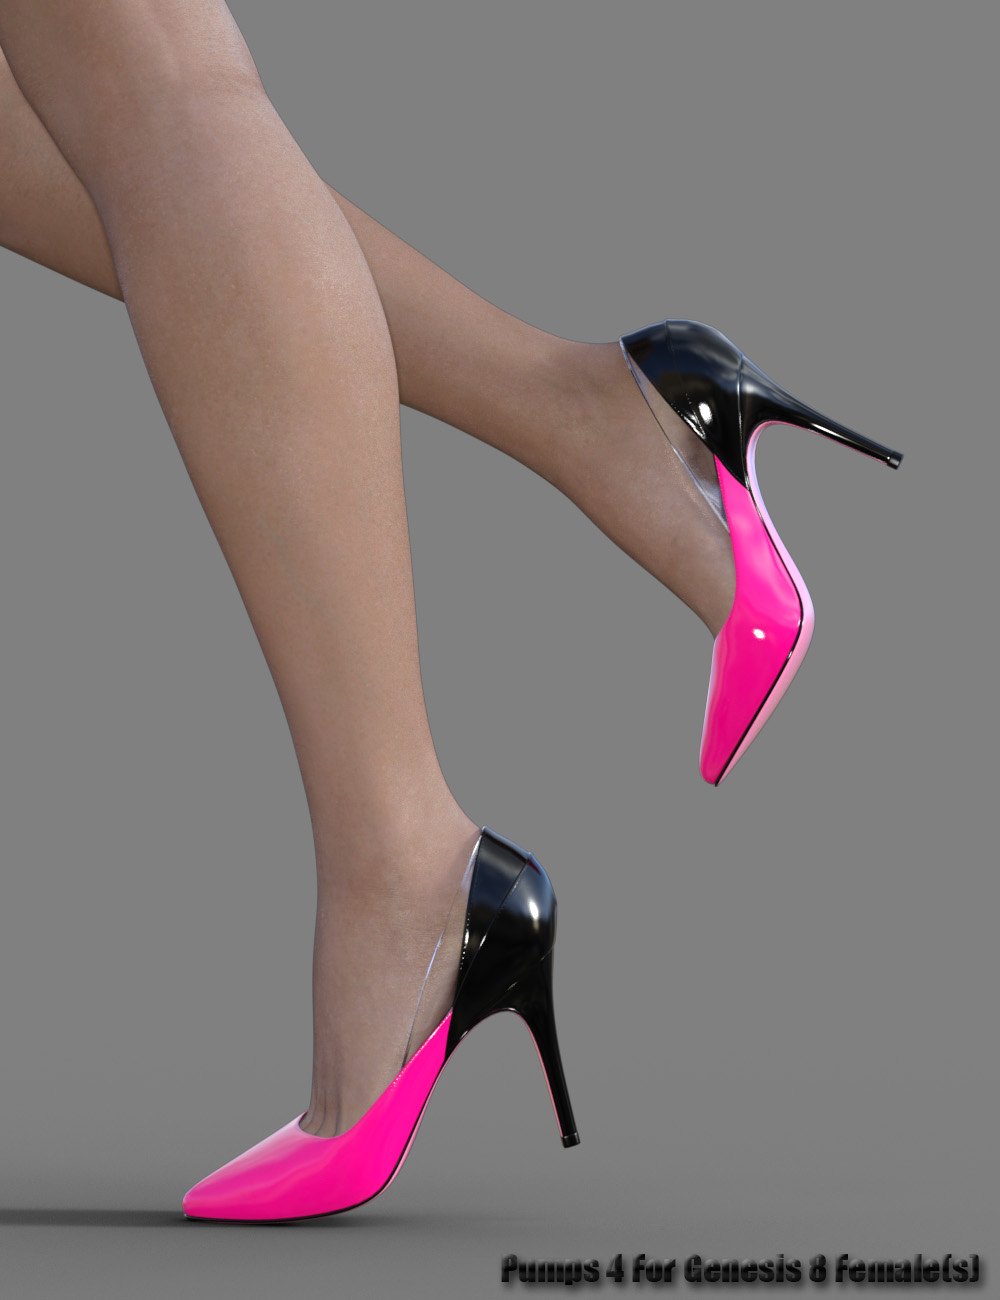 Pumps 4 for Genesis 8 Female(s) by: dx30, 3D Models by Daz 3D